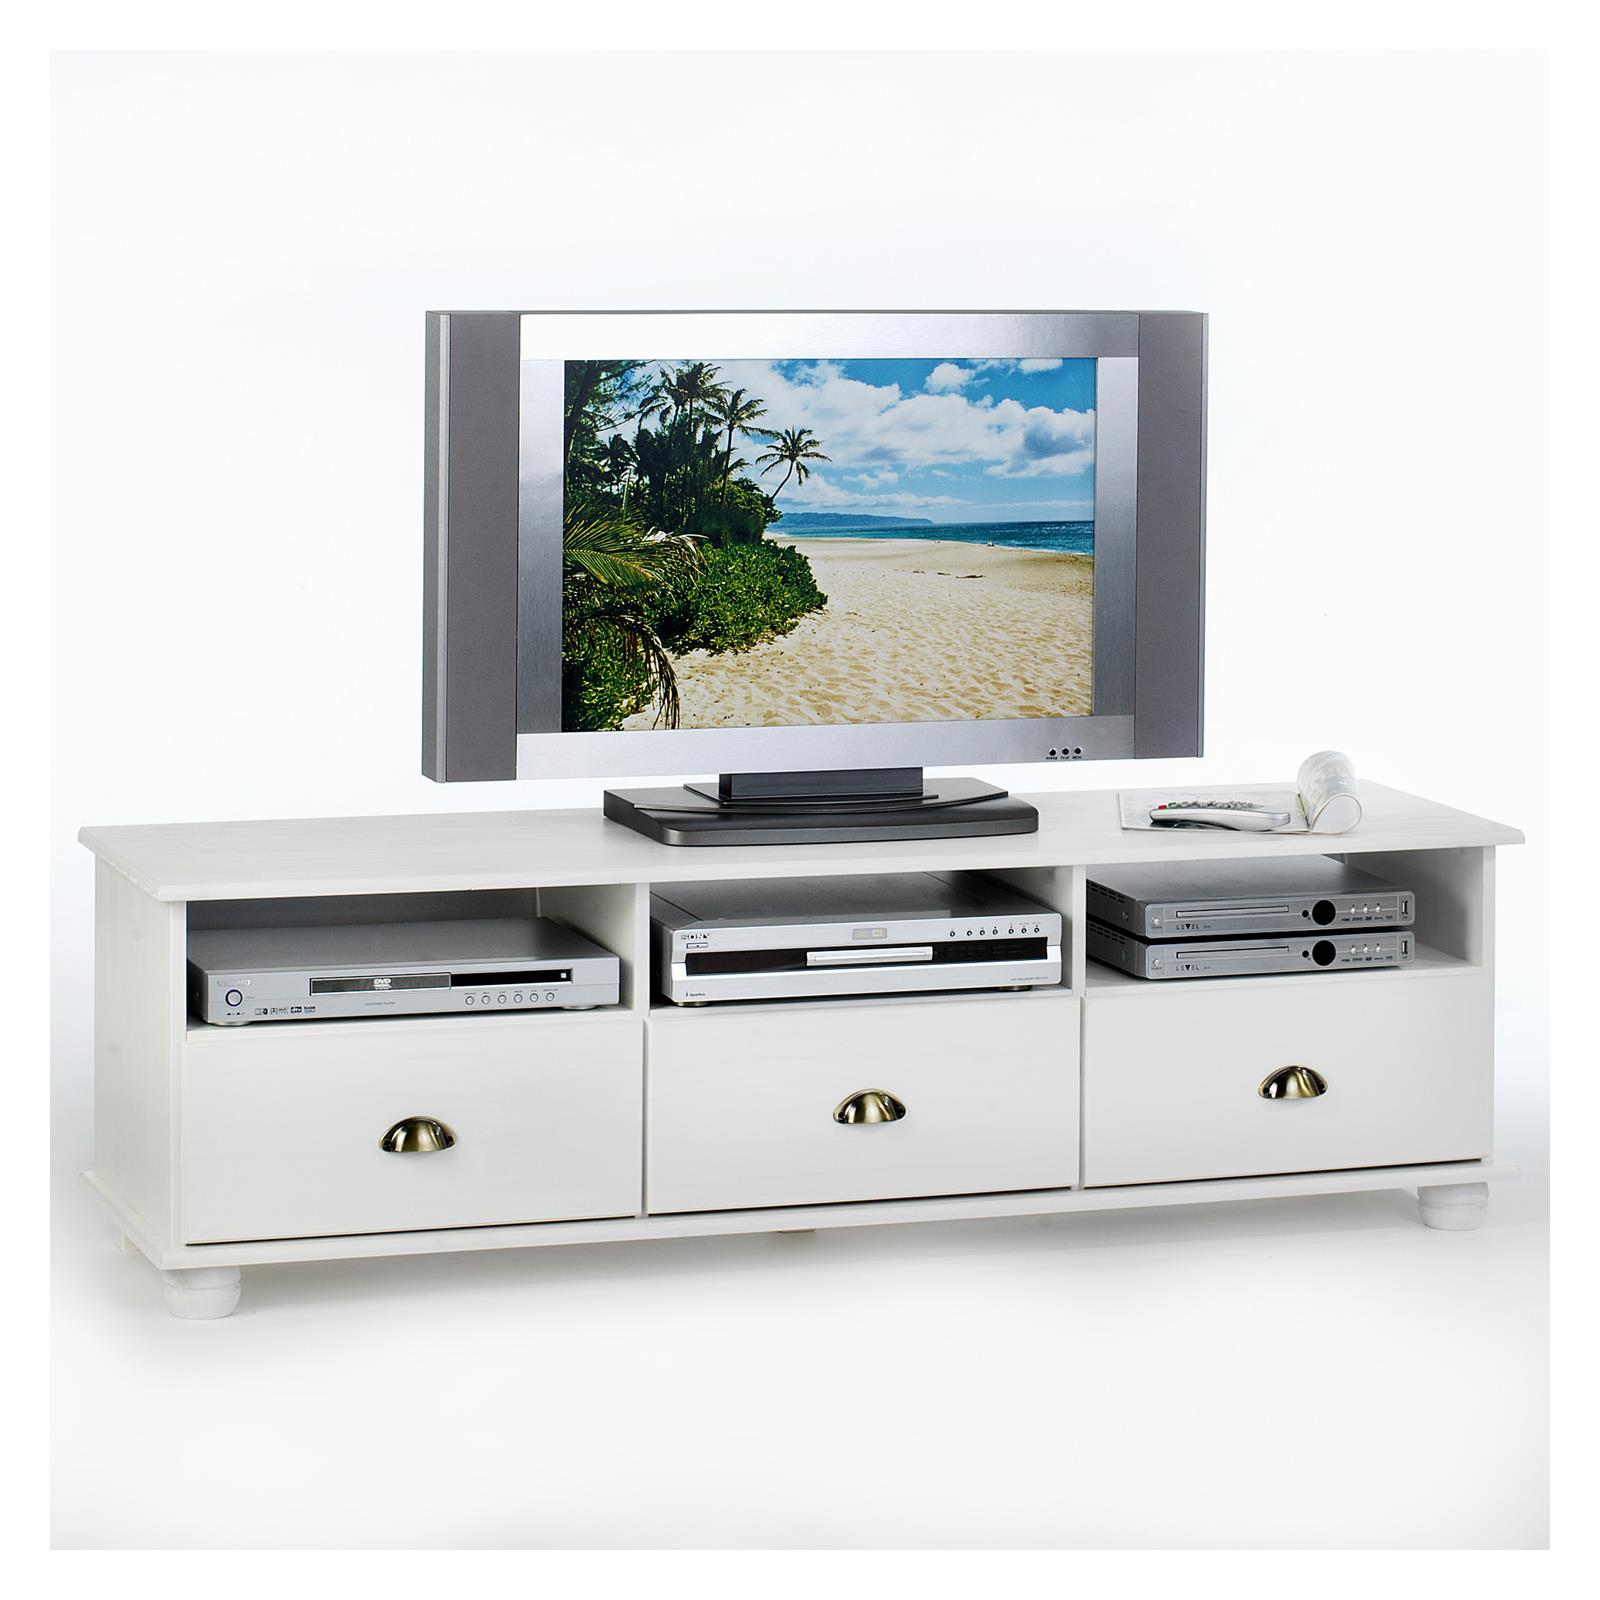 meuble tv en pin colmar 3 tiroirs 3 niches lasur blanc mobil meubles. Black Bedroom Furniture Sets. Home Design Ideas